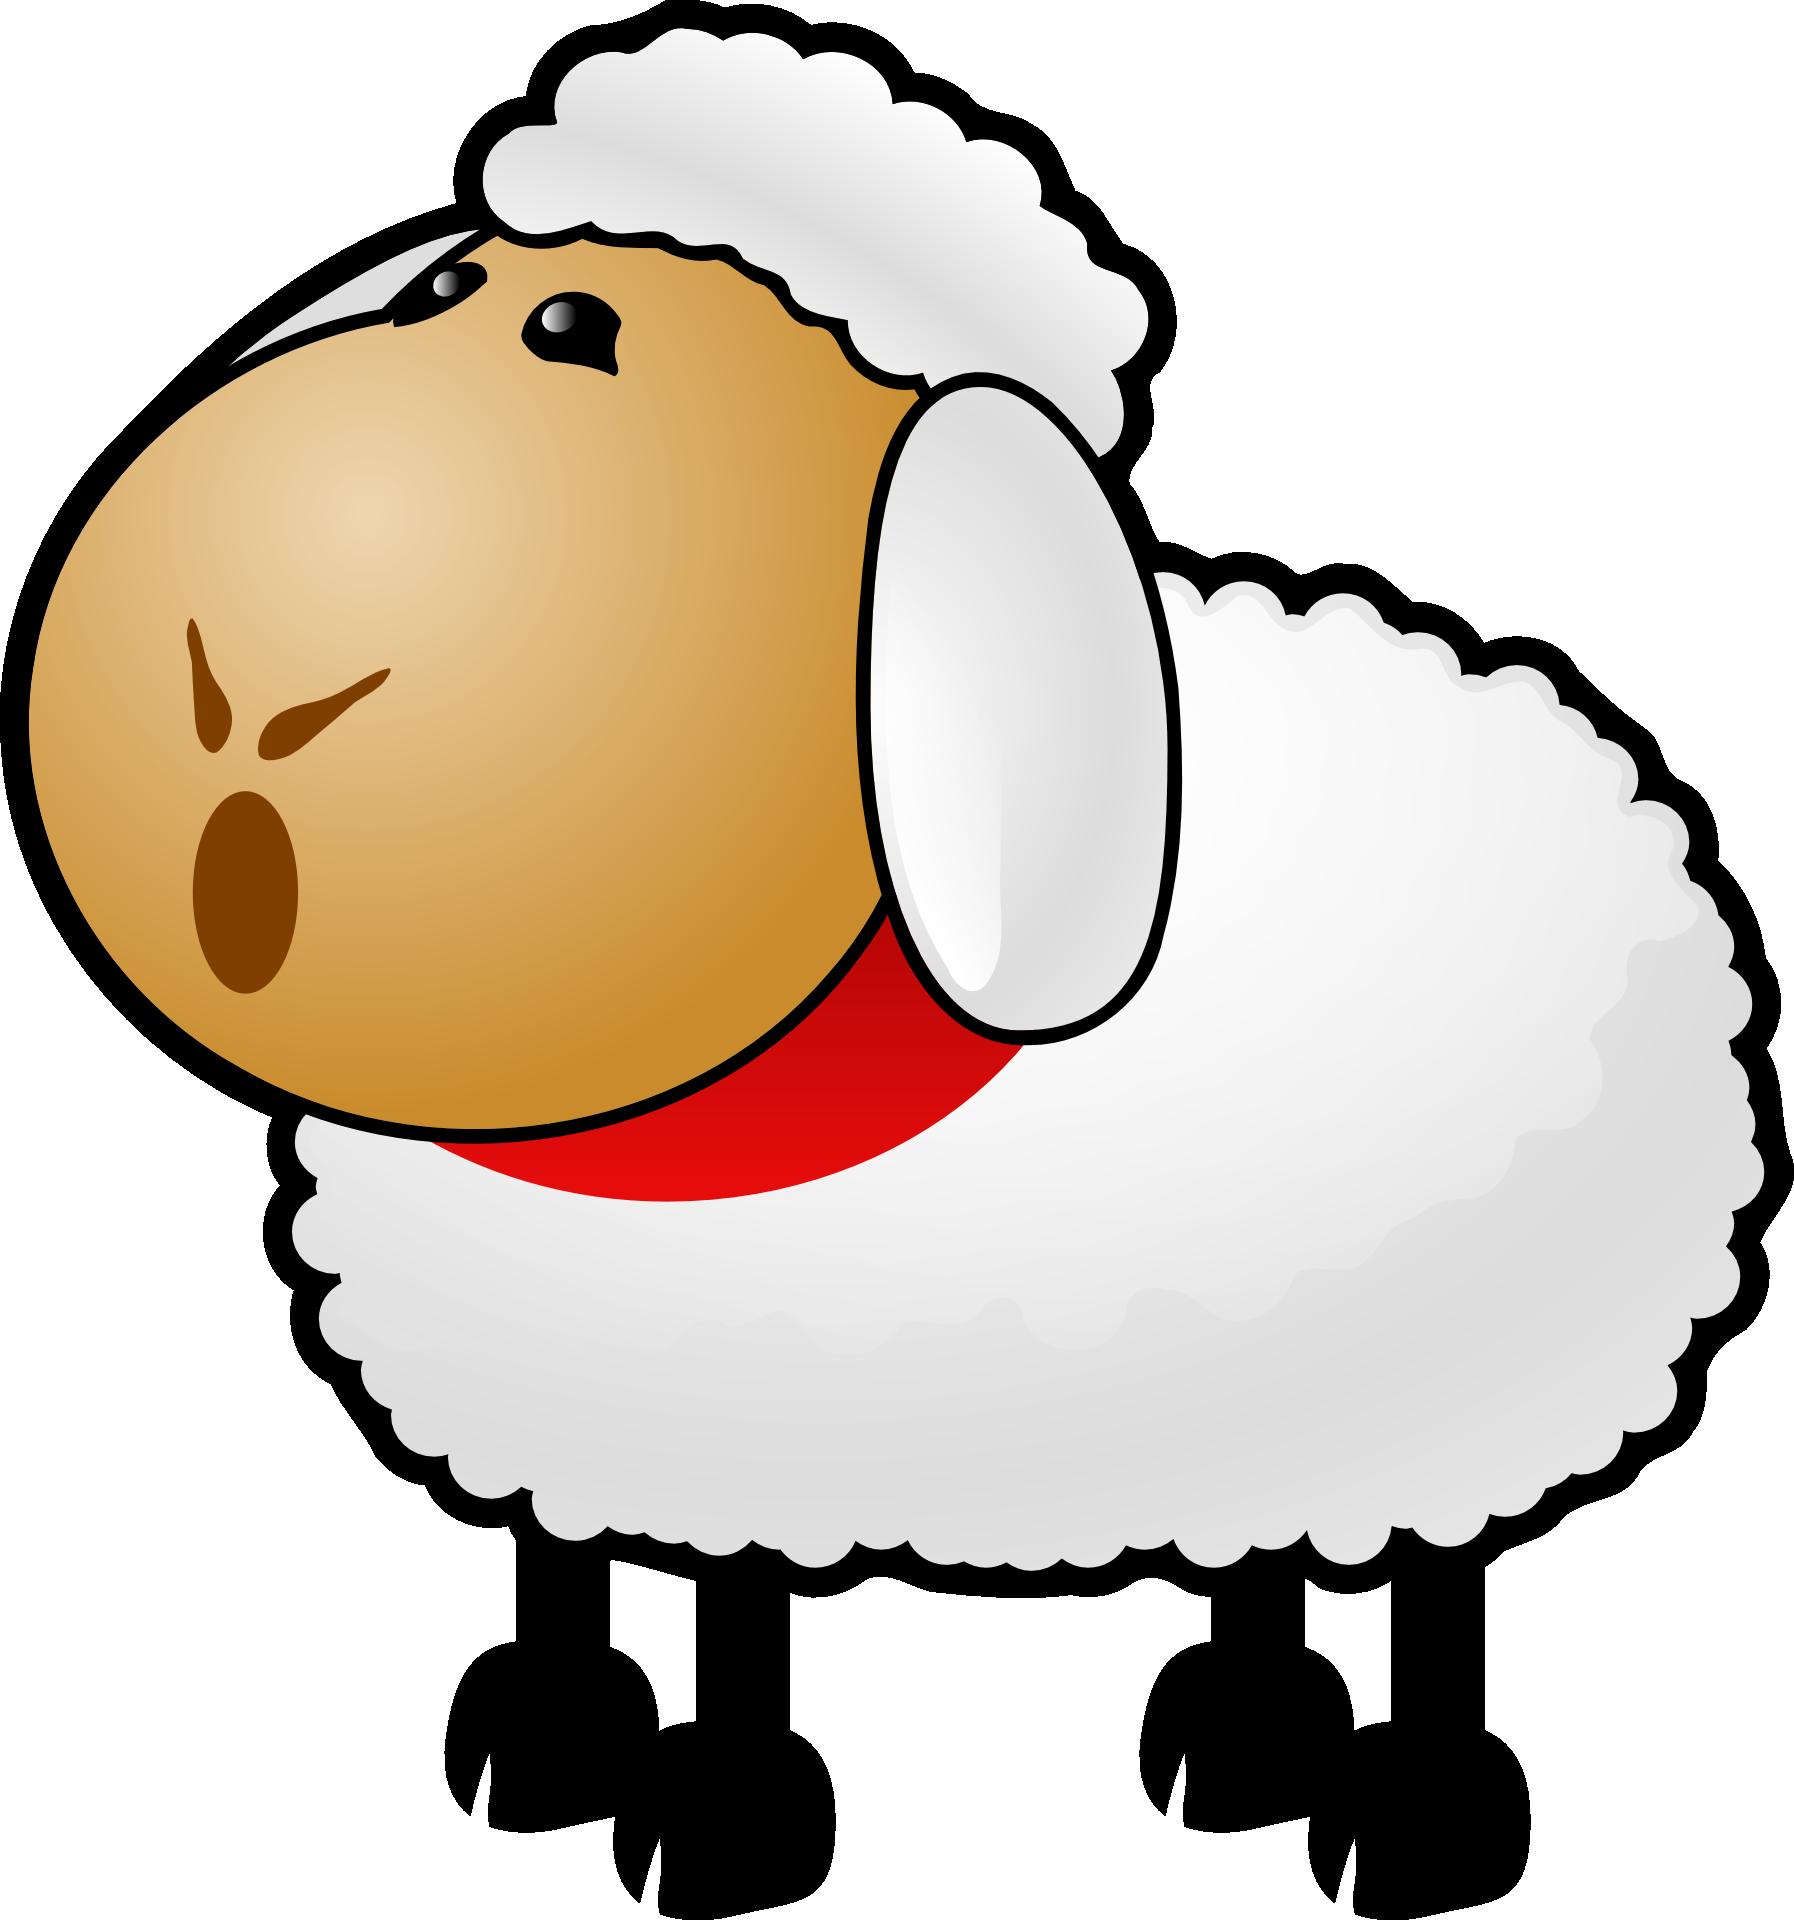 Sheep on farm clipart free image.